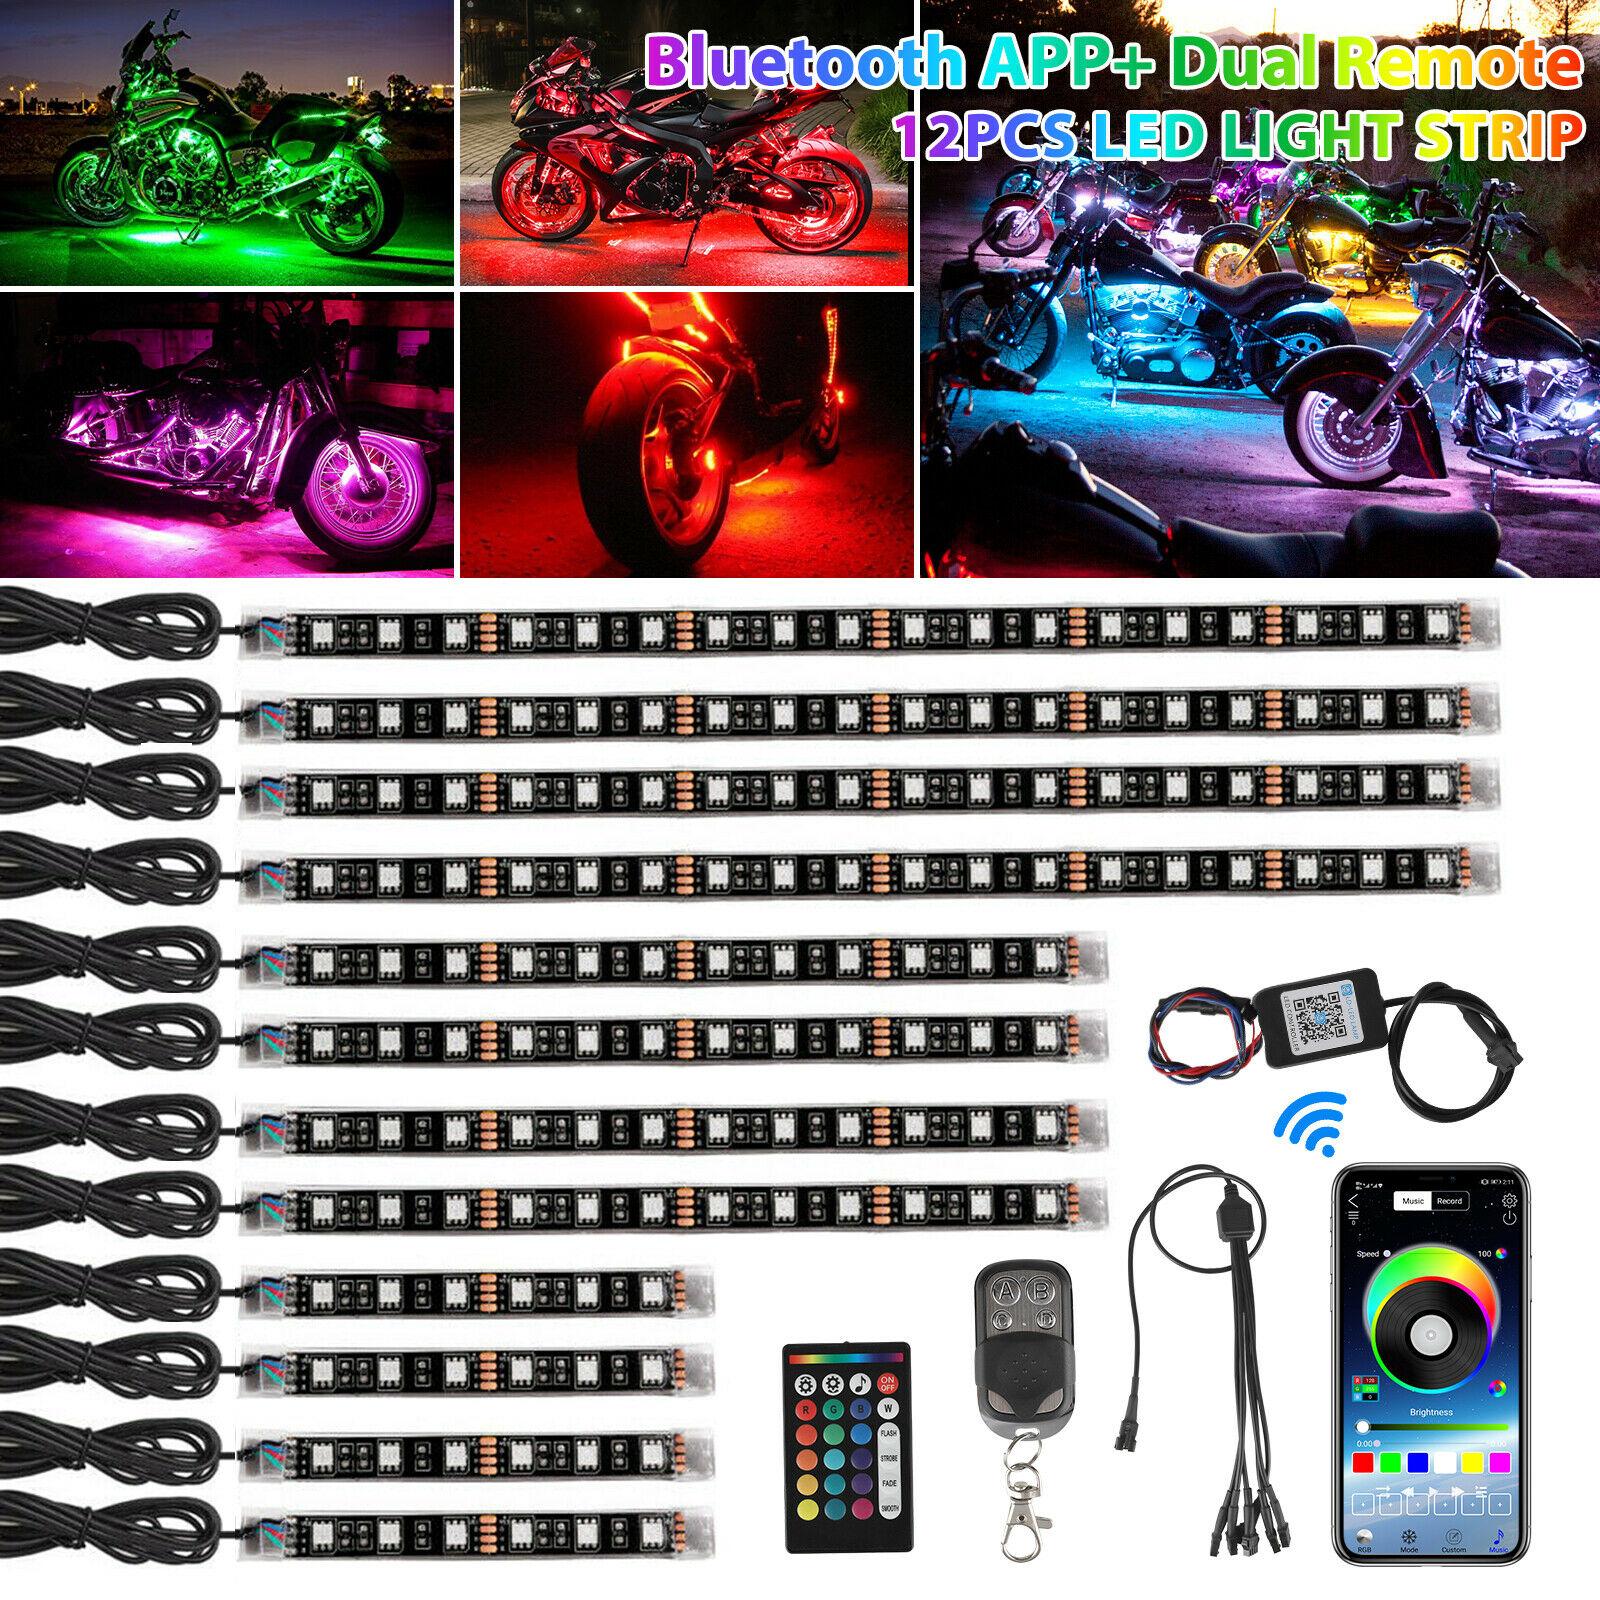 12pcs Motorcycle LED Neon Strip Lamp RGB Multicolor Under Glow Lights APP Remote Control 5050SMD LED Car Decorative Light Strip